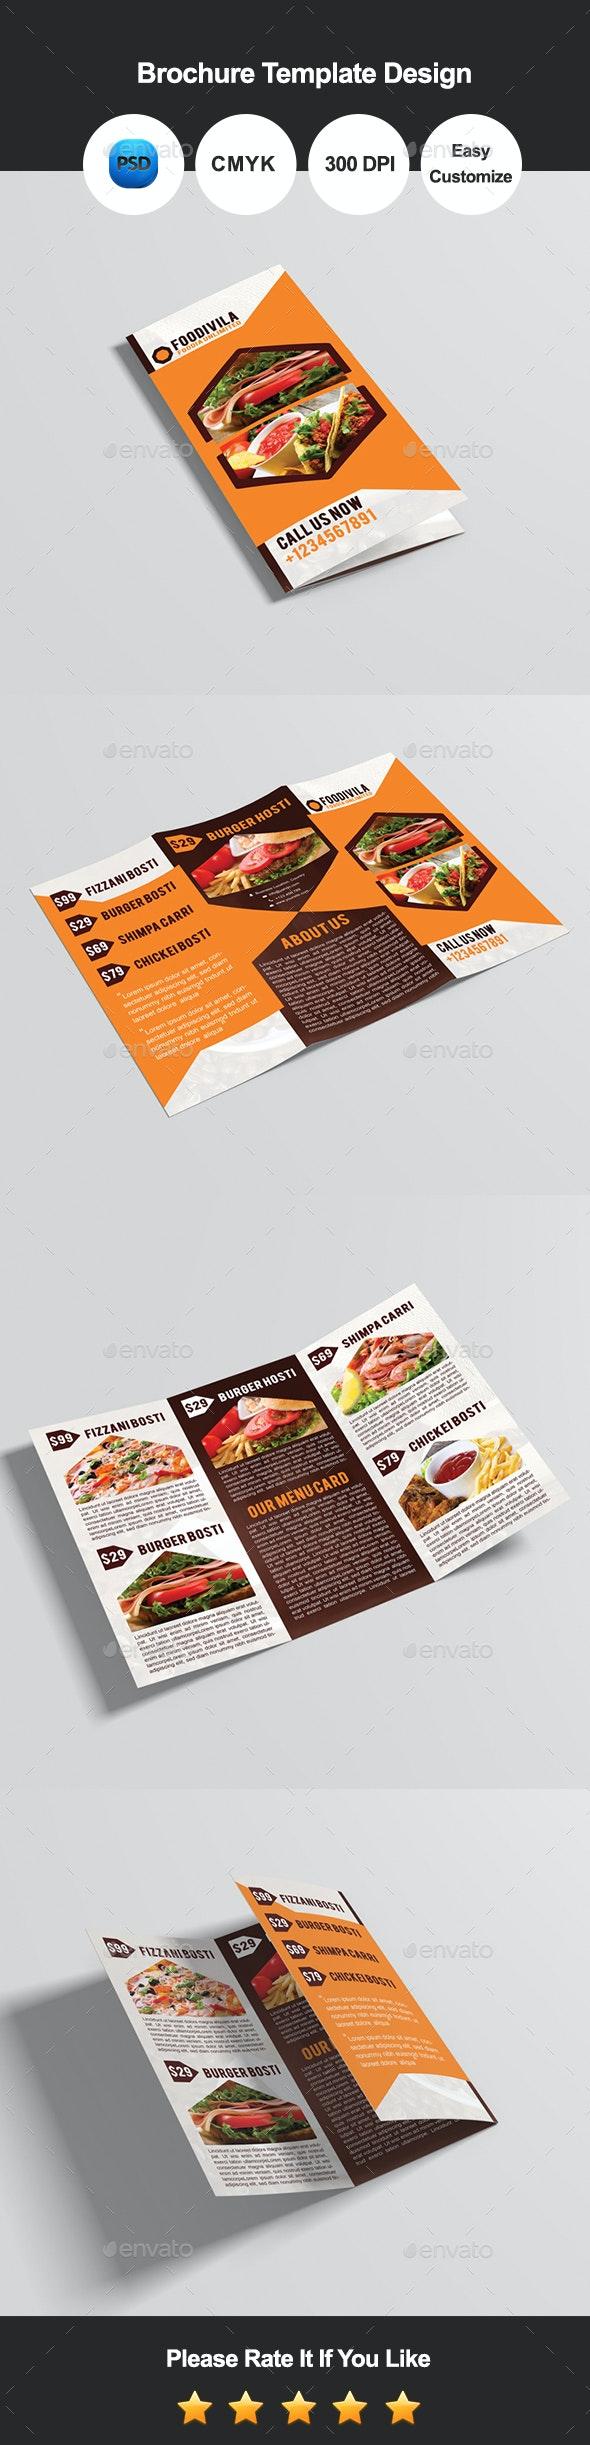 Foodivila Tri Fold Food & Restaurant Brochure Template Design - Catalogs Brochures